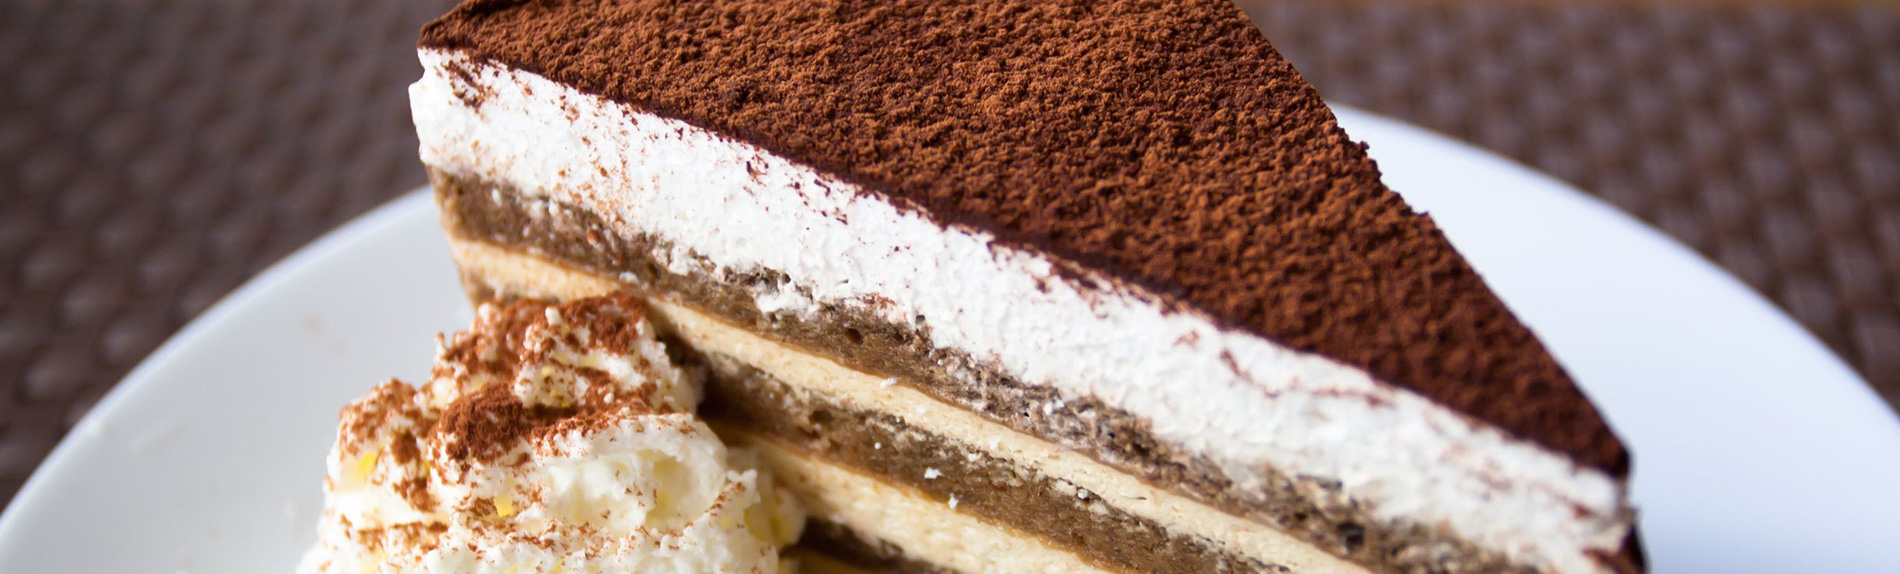 Sides & Desserts